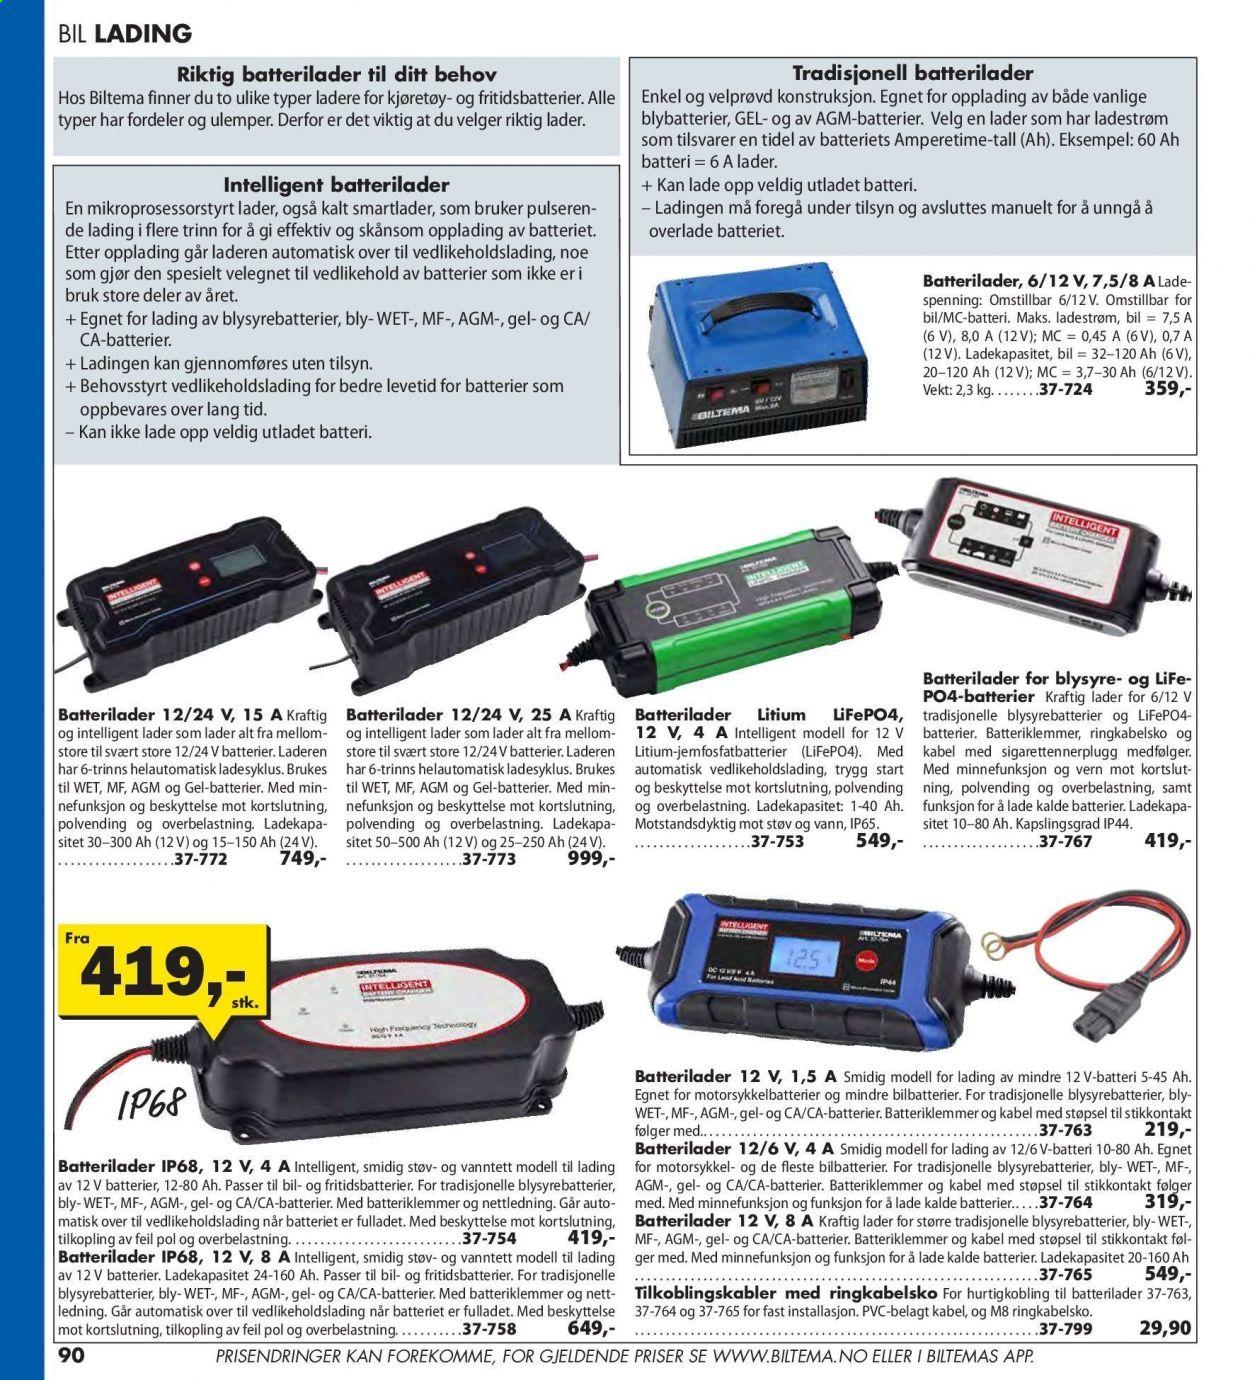 Batterilader Litium LiFePO4, 12 V, 4 A Biltema.no